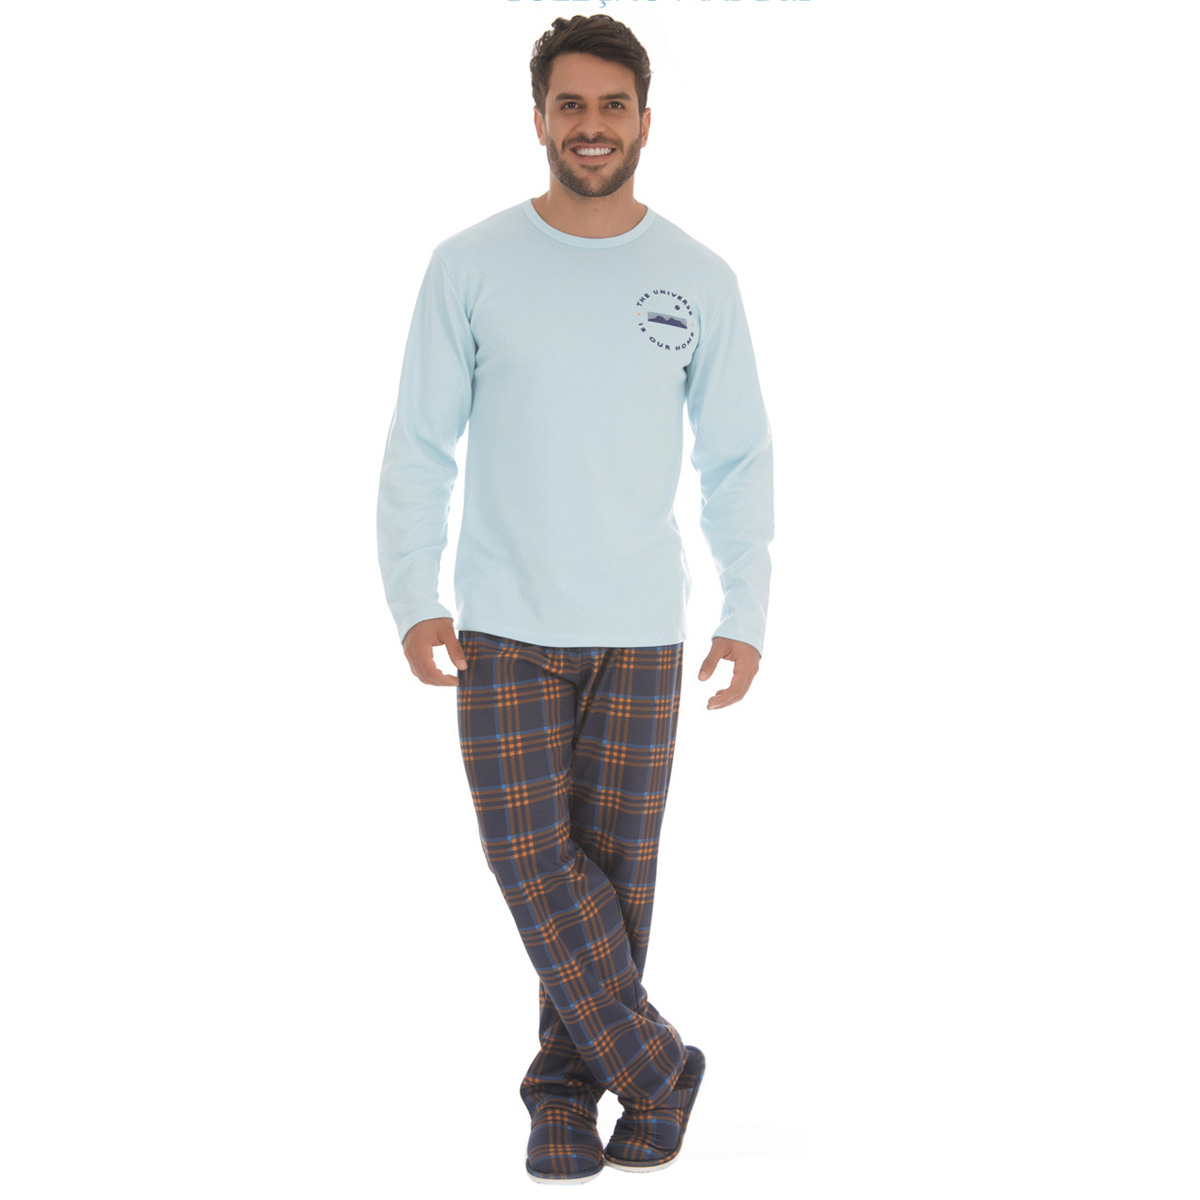 Pijama masculino de inverno TOP Victory